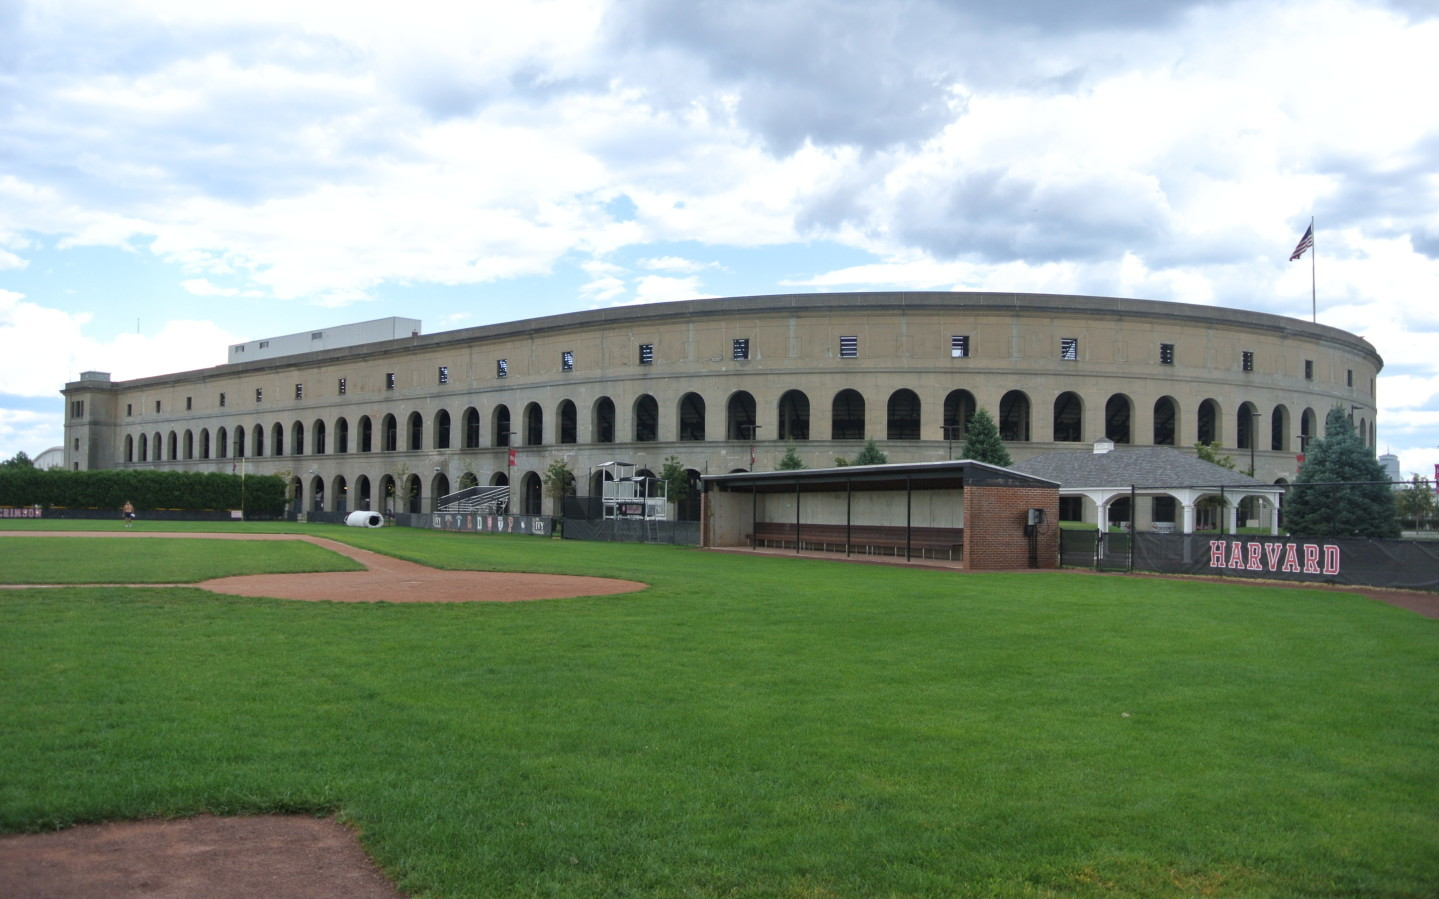 Harvard Stadium 2016